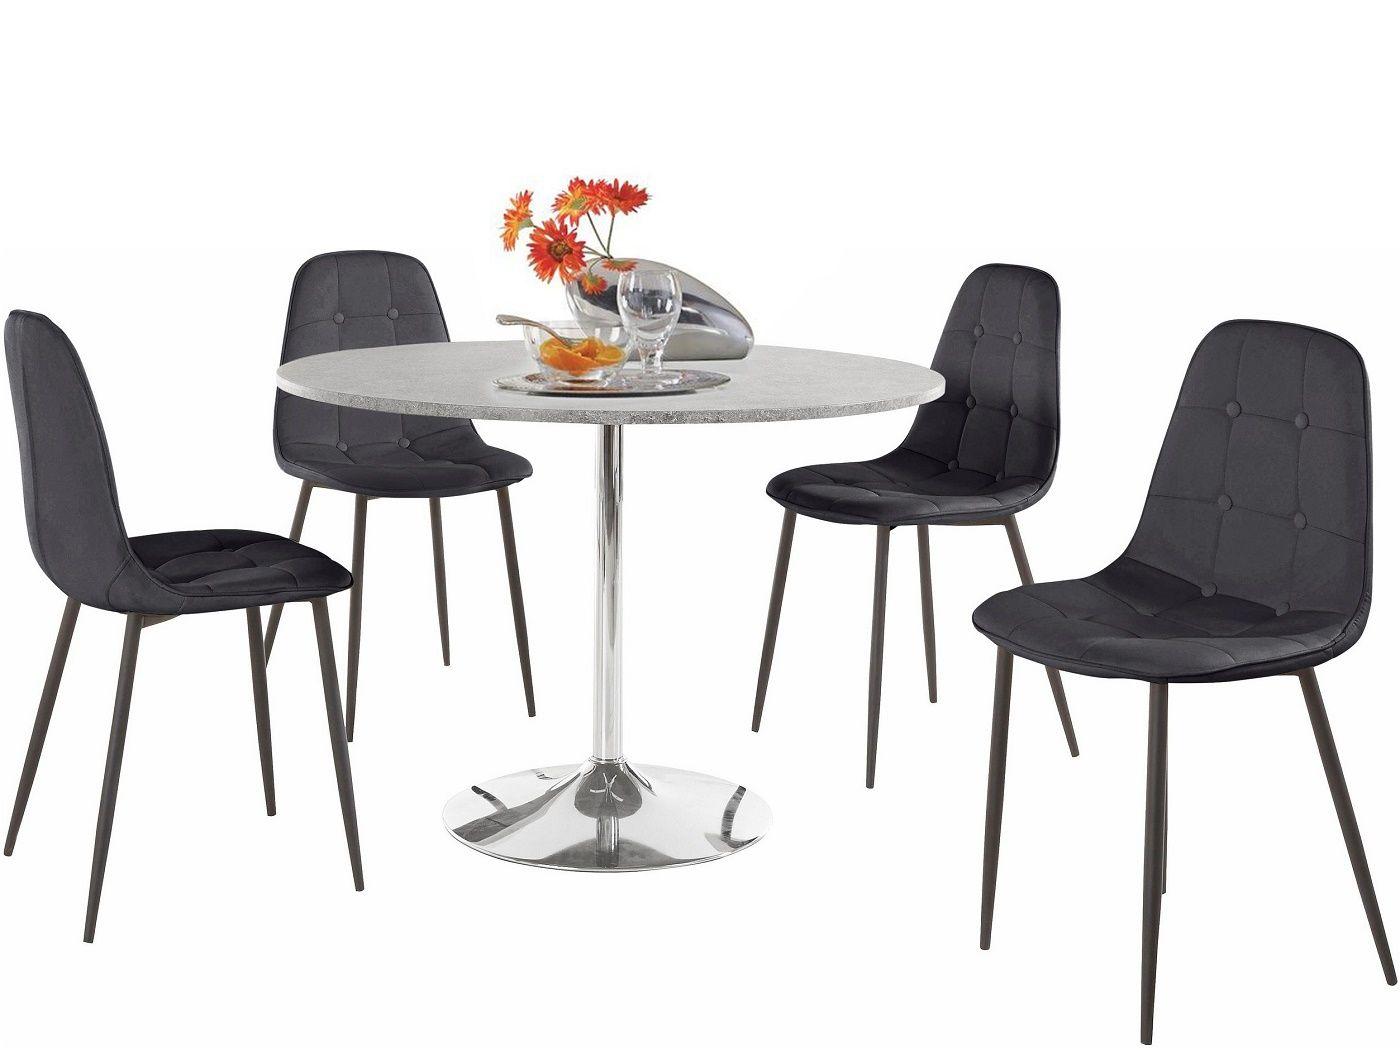 Terri Spisebord Ø110 cm  - Folie m/beton look - Rundt spisebord i betonlook